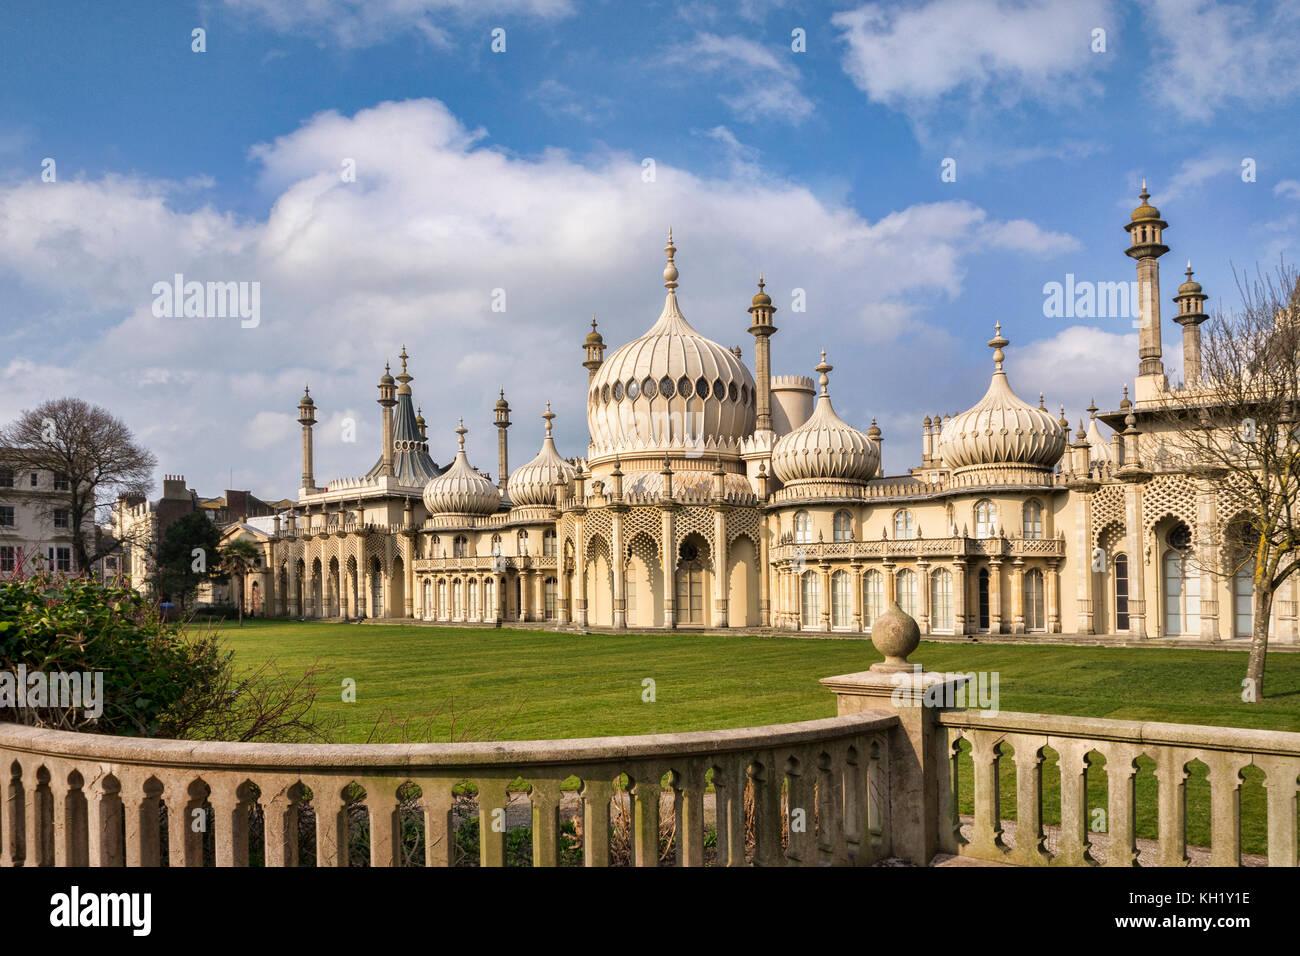 Royal Pavilion, Brighton, Sussex, Inglaterra, Reino Unido. Imagen De Stock